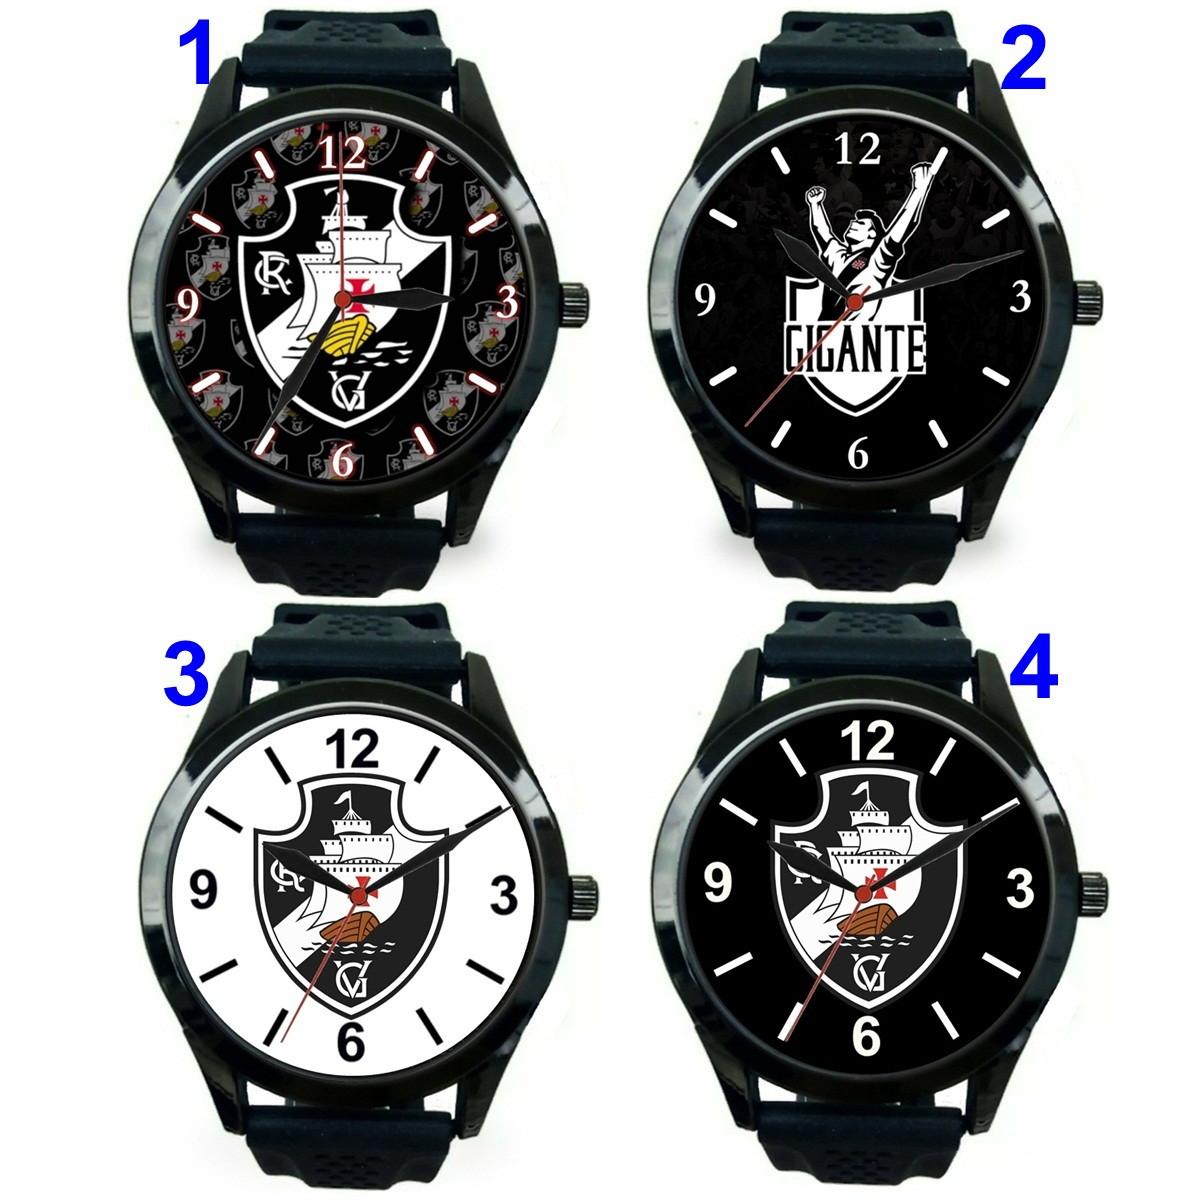 69ad23fa260 1 Relógio pulso personalizado esportivo Vasco barato no Elo7 ...